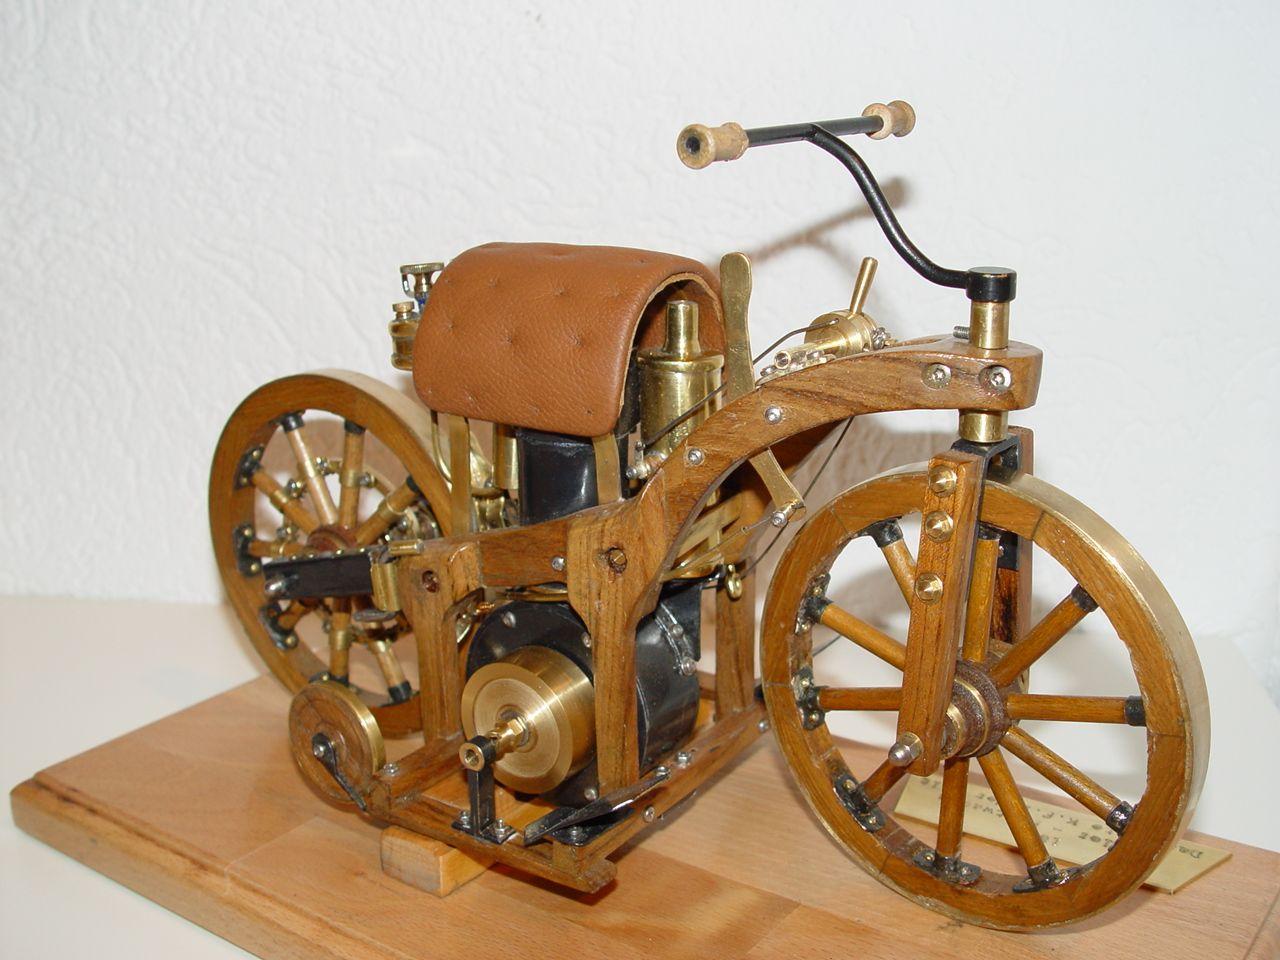 Daimler - Reitwagen - Erstes Motorrad - Funktionsmodell